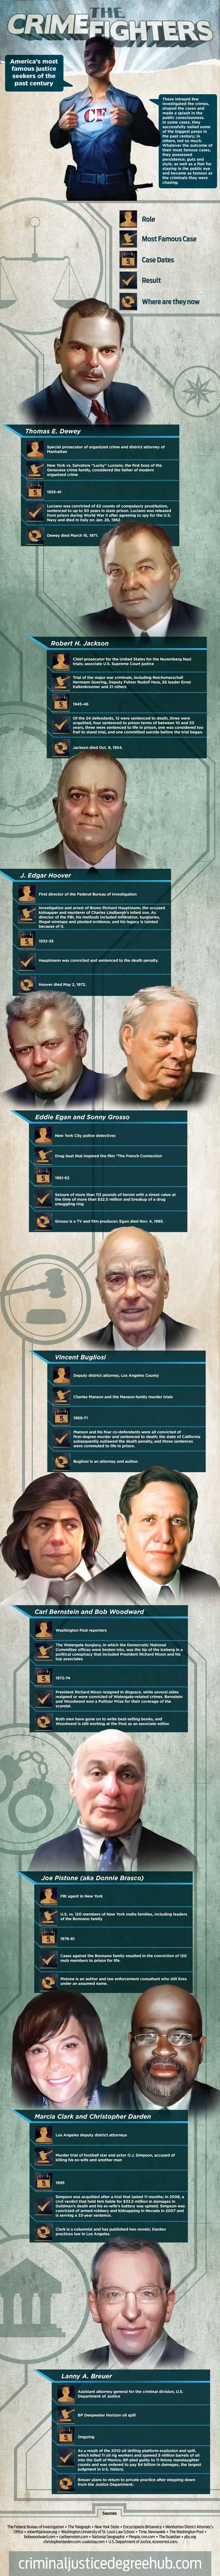 American Justice Advocates-Infographic